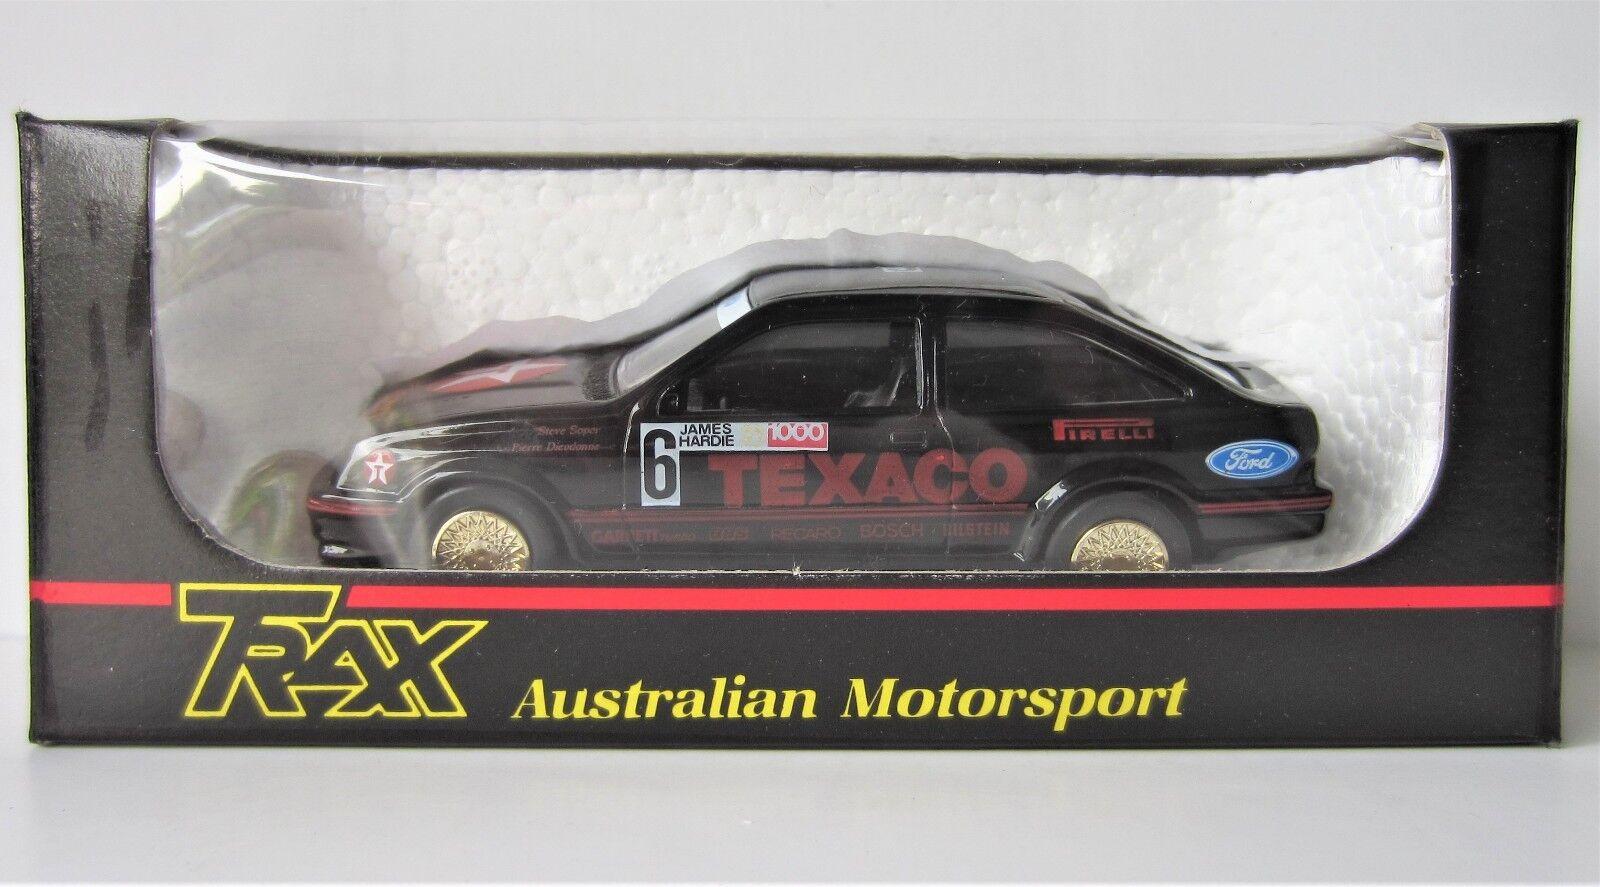 Trax MINT diecast 8023 Bathurst Texaco FORD SIERRA COSWORTH 1987 model 1 43